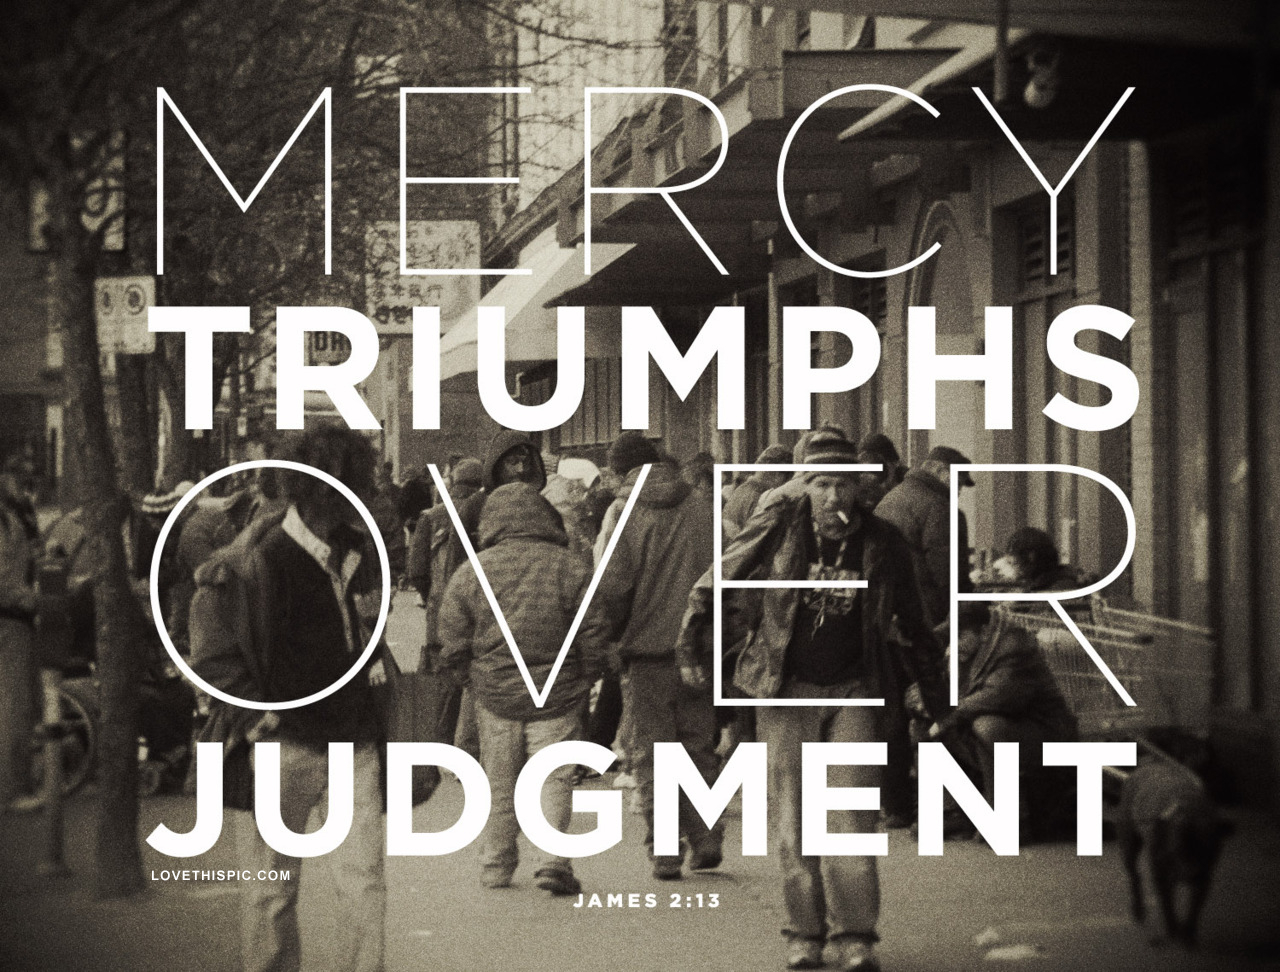 Mercy Trumps Judgement